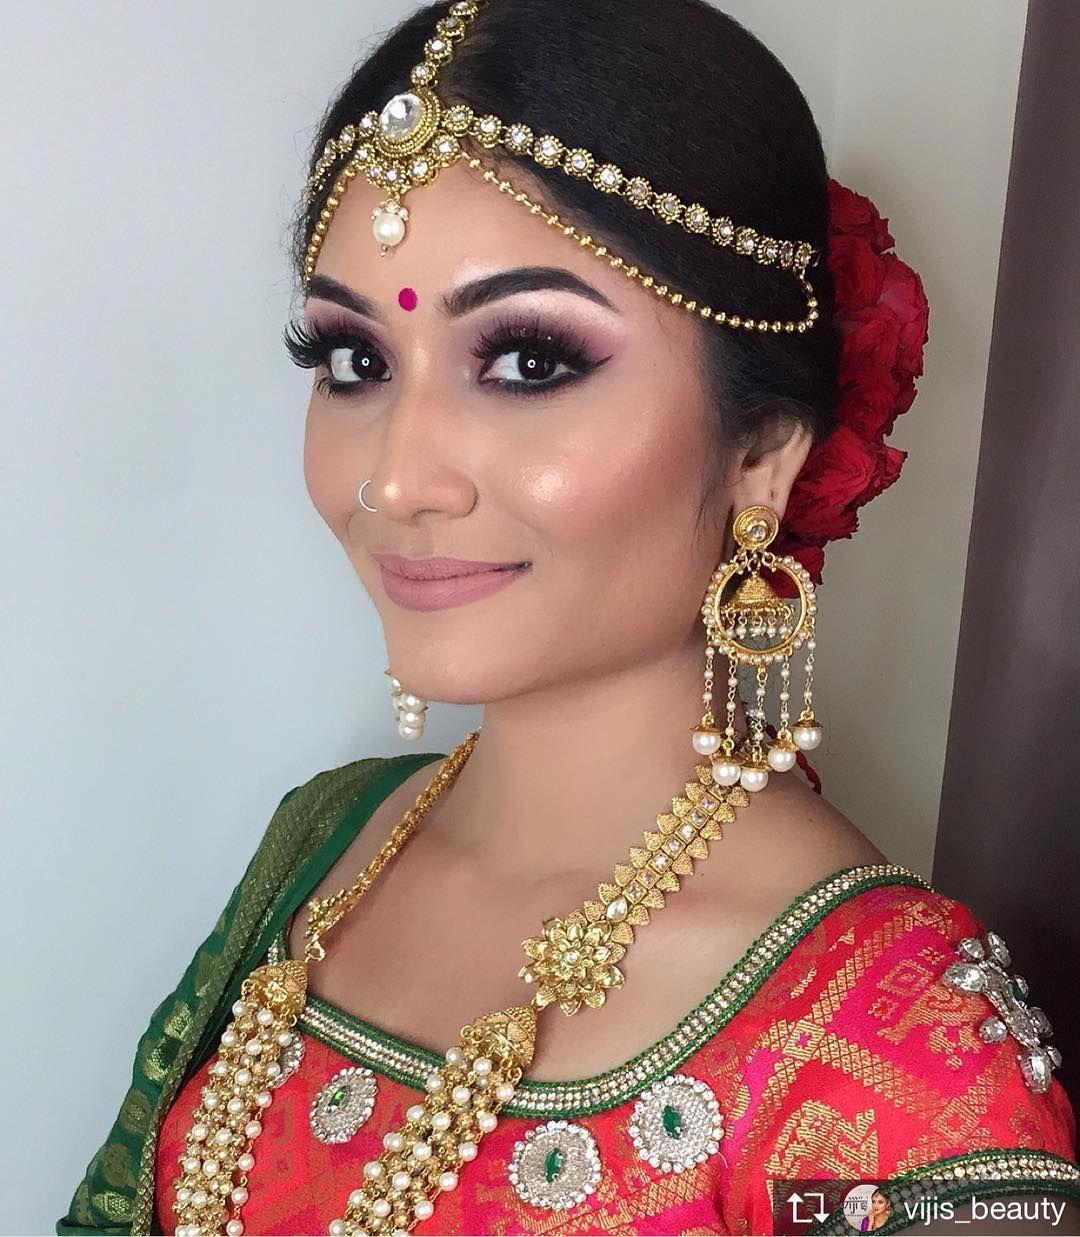 259 Likes, 1 Comments KALYANAM BAZAAR (kalyanambazaar